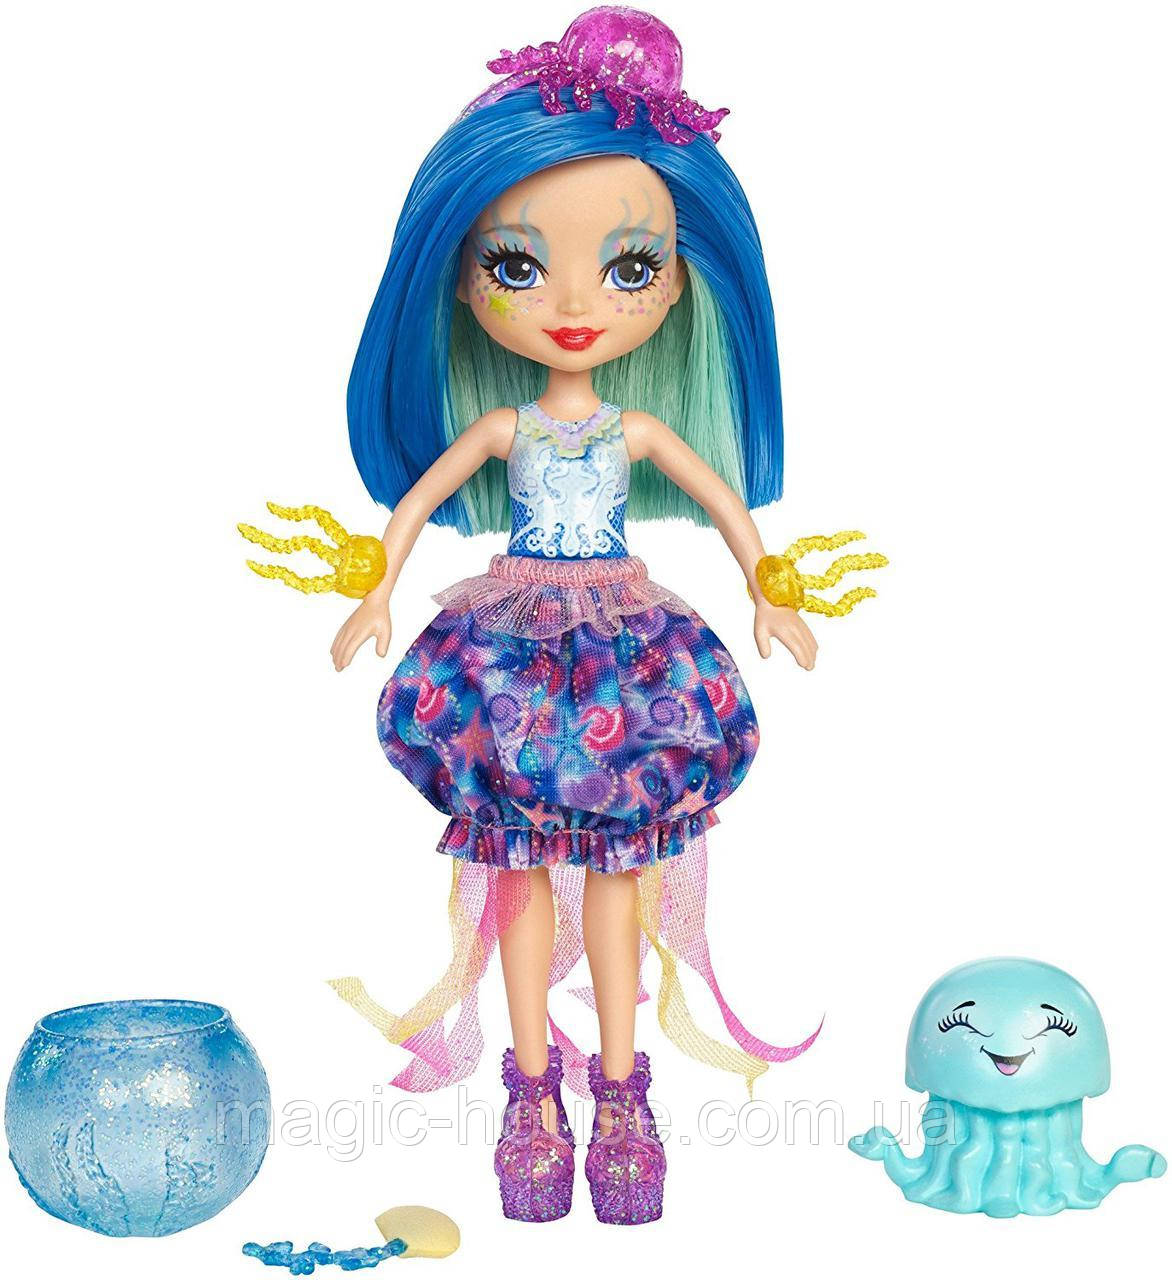 Кукла Энчантималс Медуза Джесса и друг медуза Мариса  Enchantimals Jessa Jellyfish & Marisa Water Animal Figu